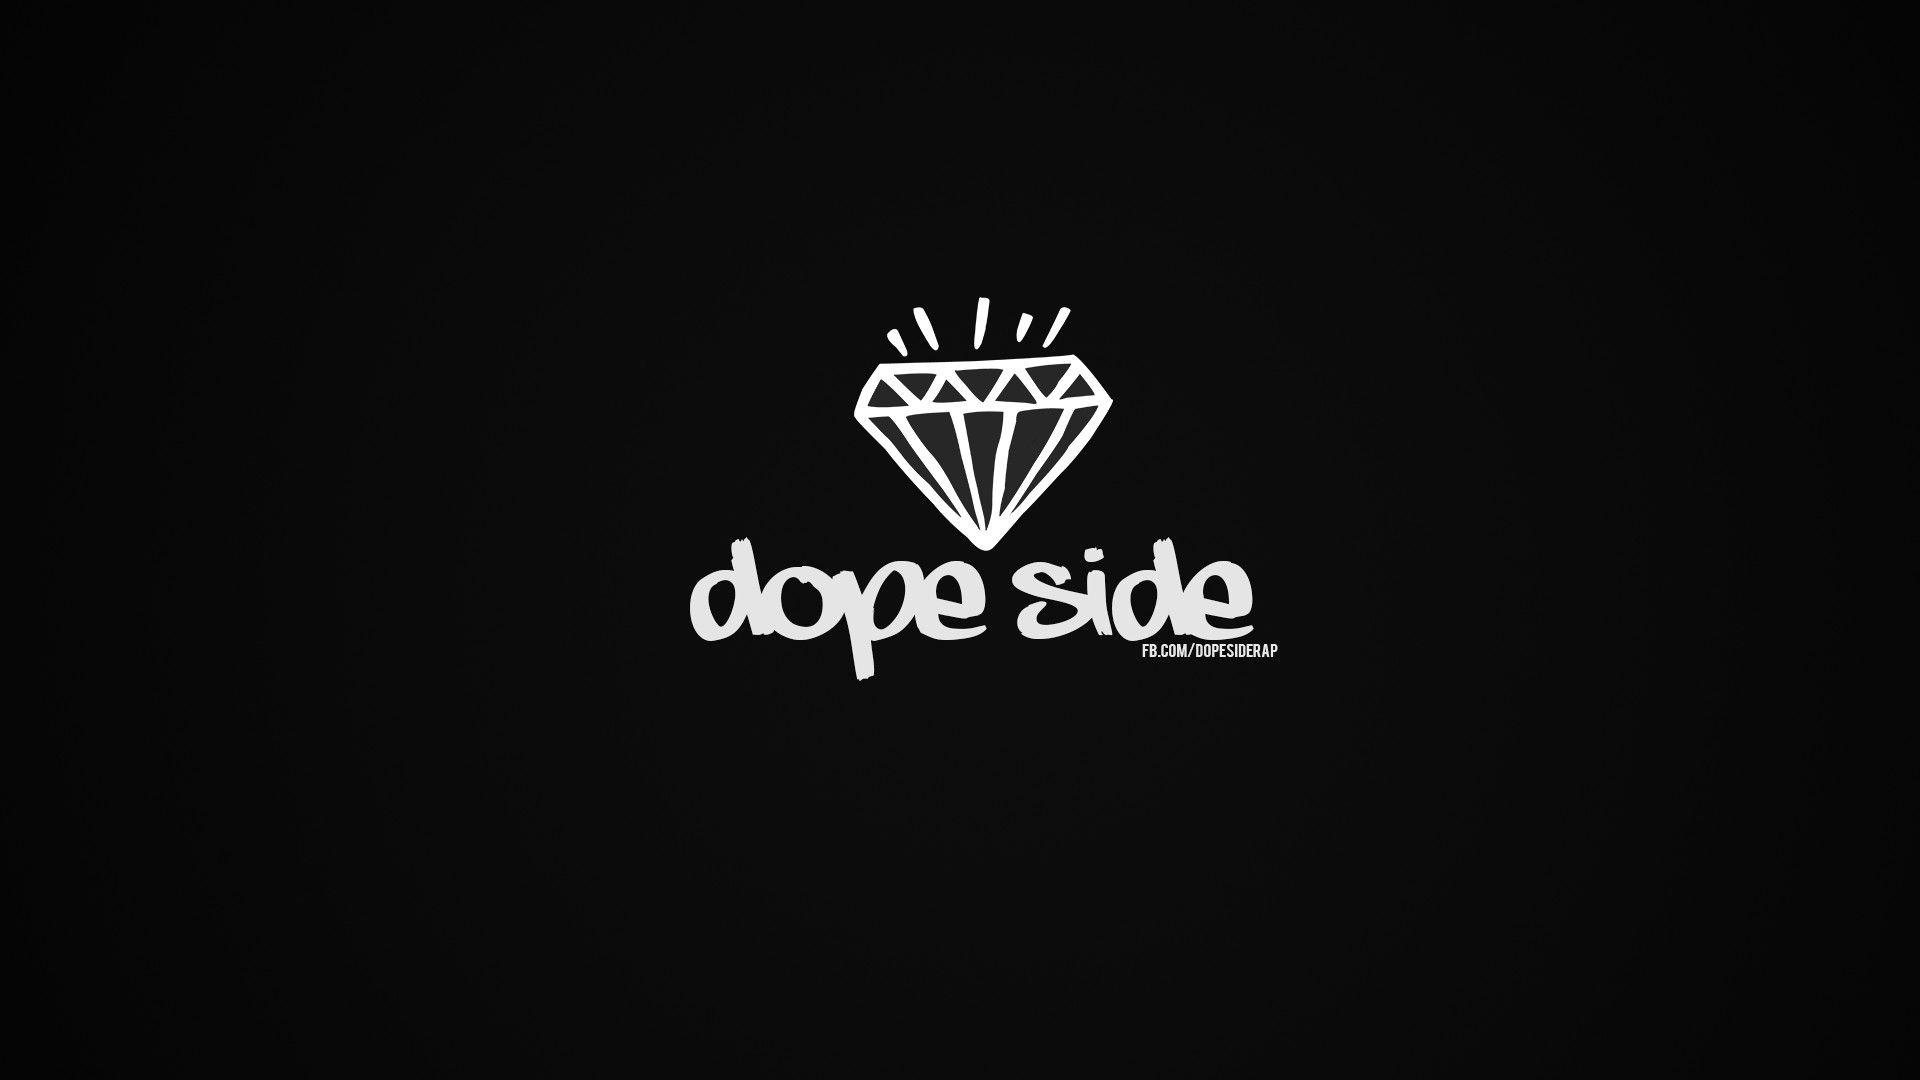 Hdwallpaper20 Com: Dope Nike Wallpaper Hdwallpaper20 Com